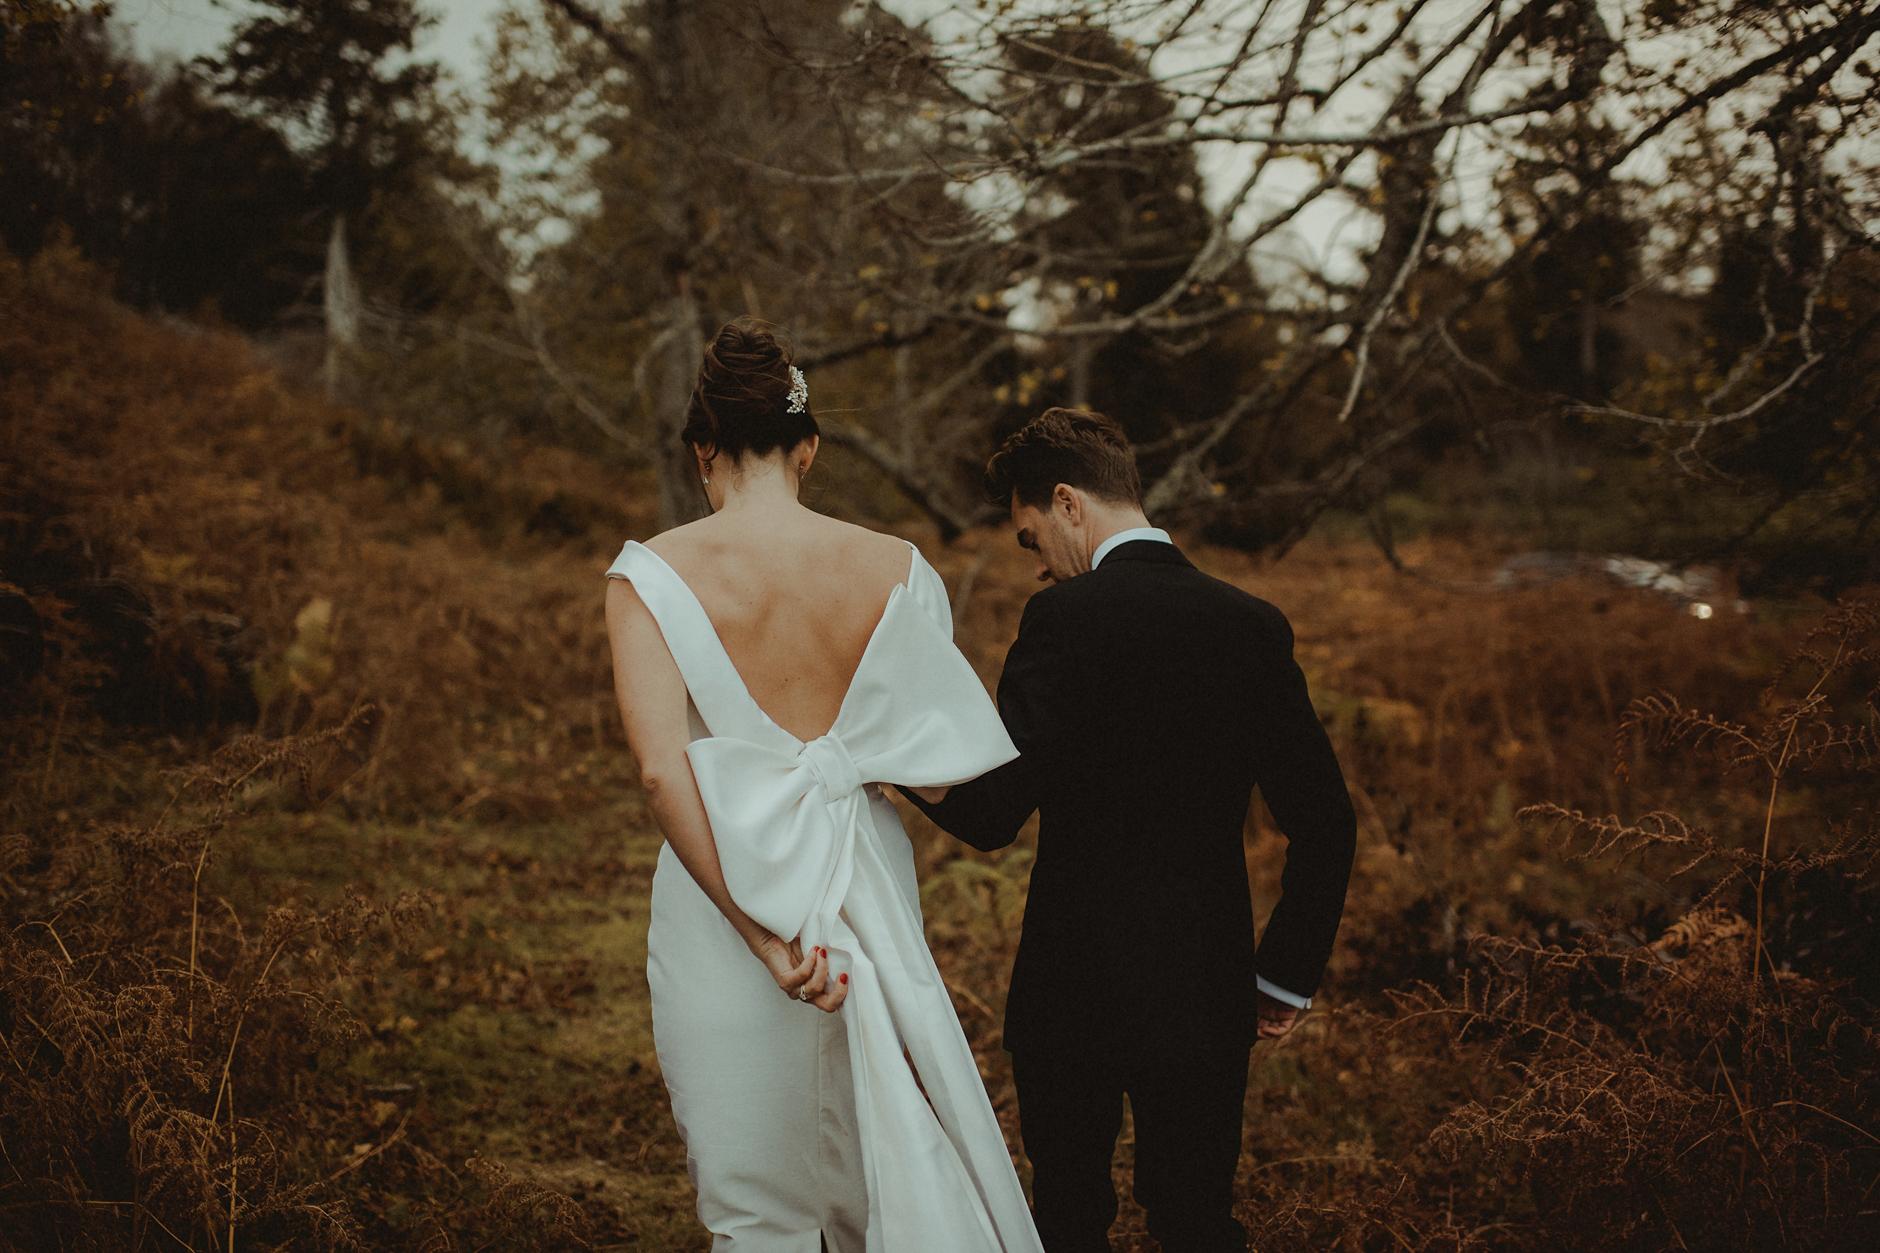 Glentruim-Wedding-Nikki-Leadbetter-Photography-185.jpg